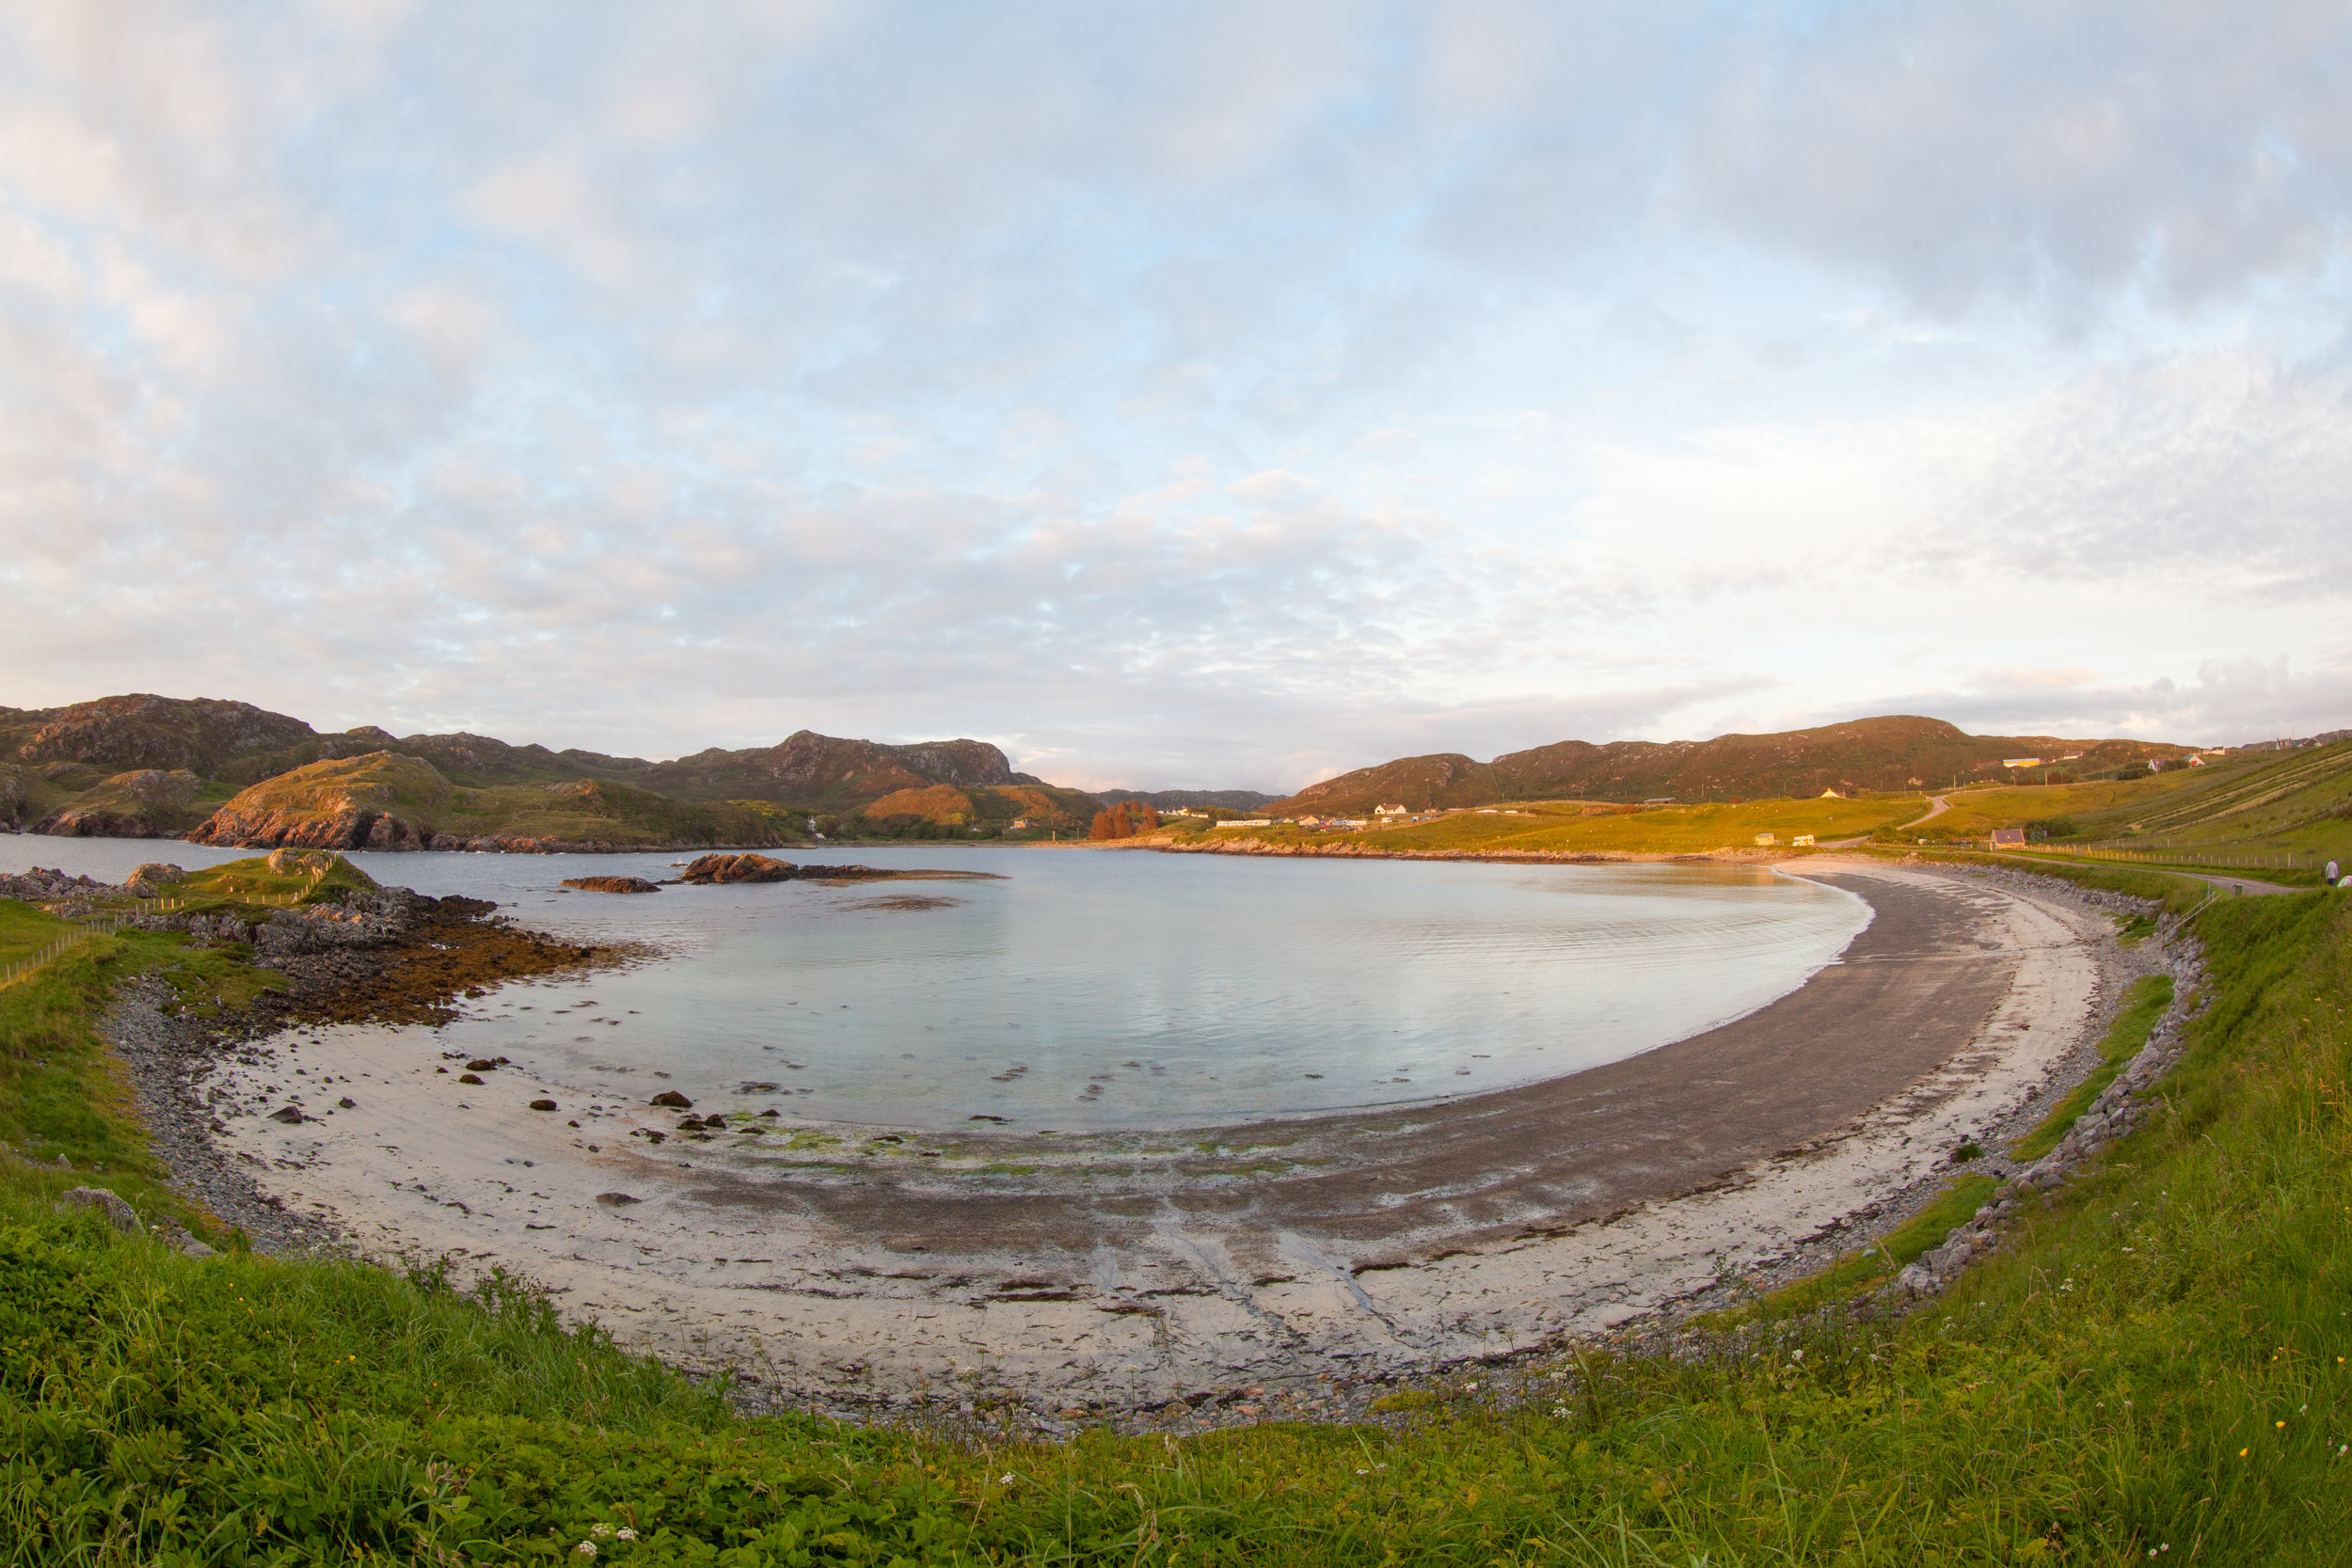 A fish eye capture of a circular beach in Scotland.